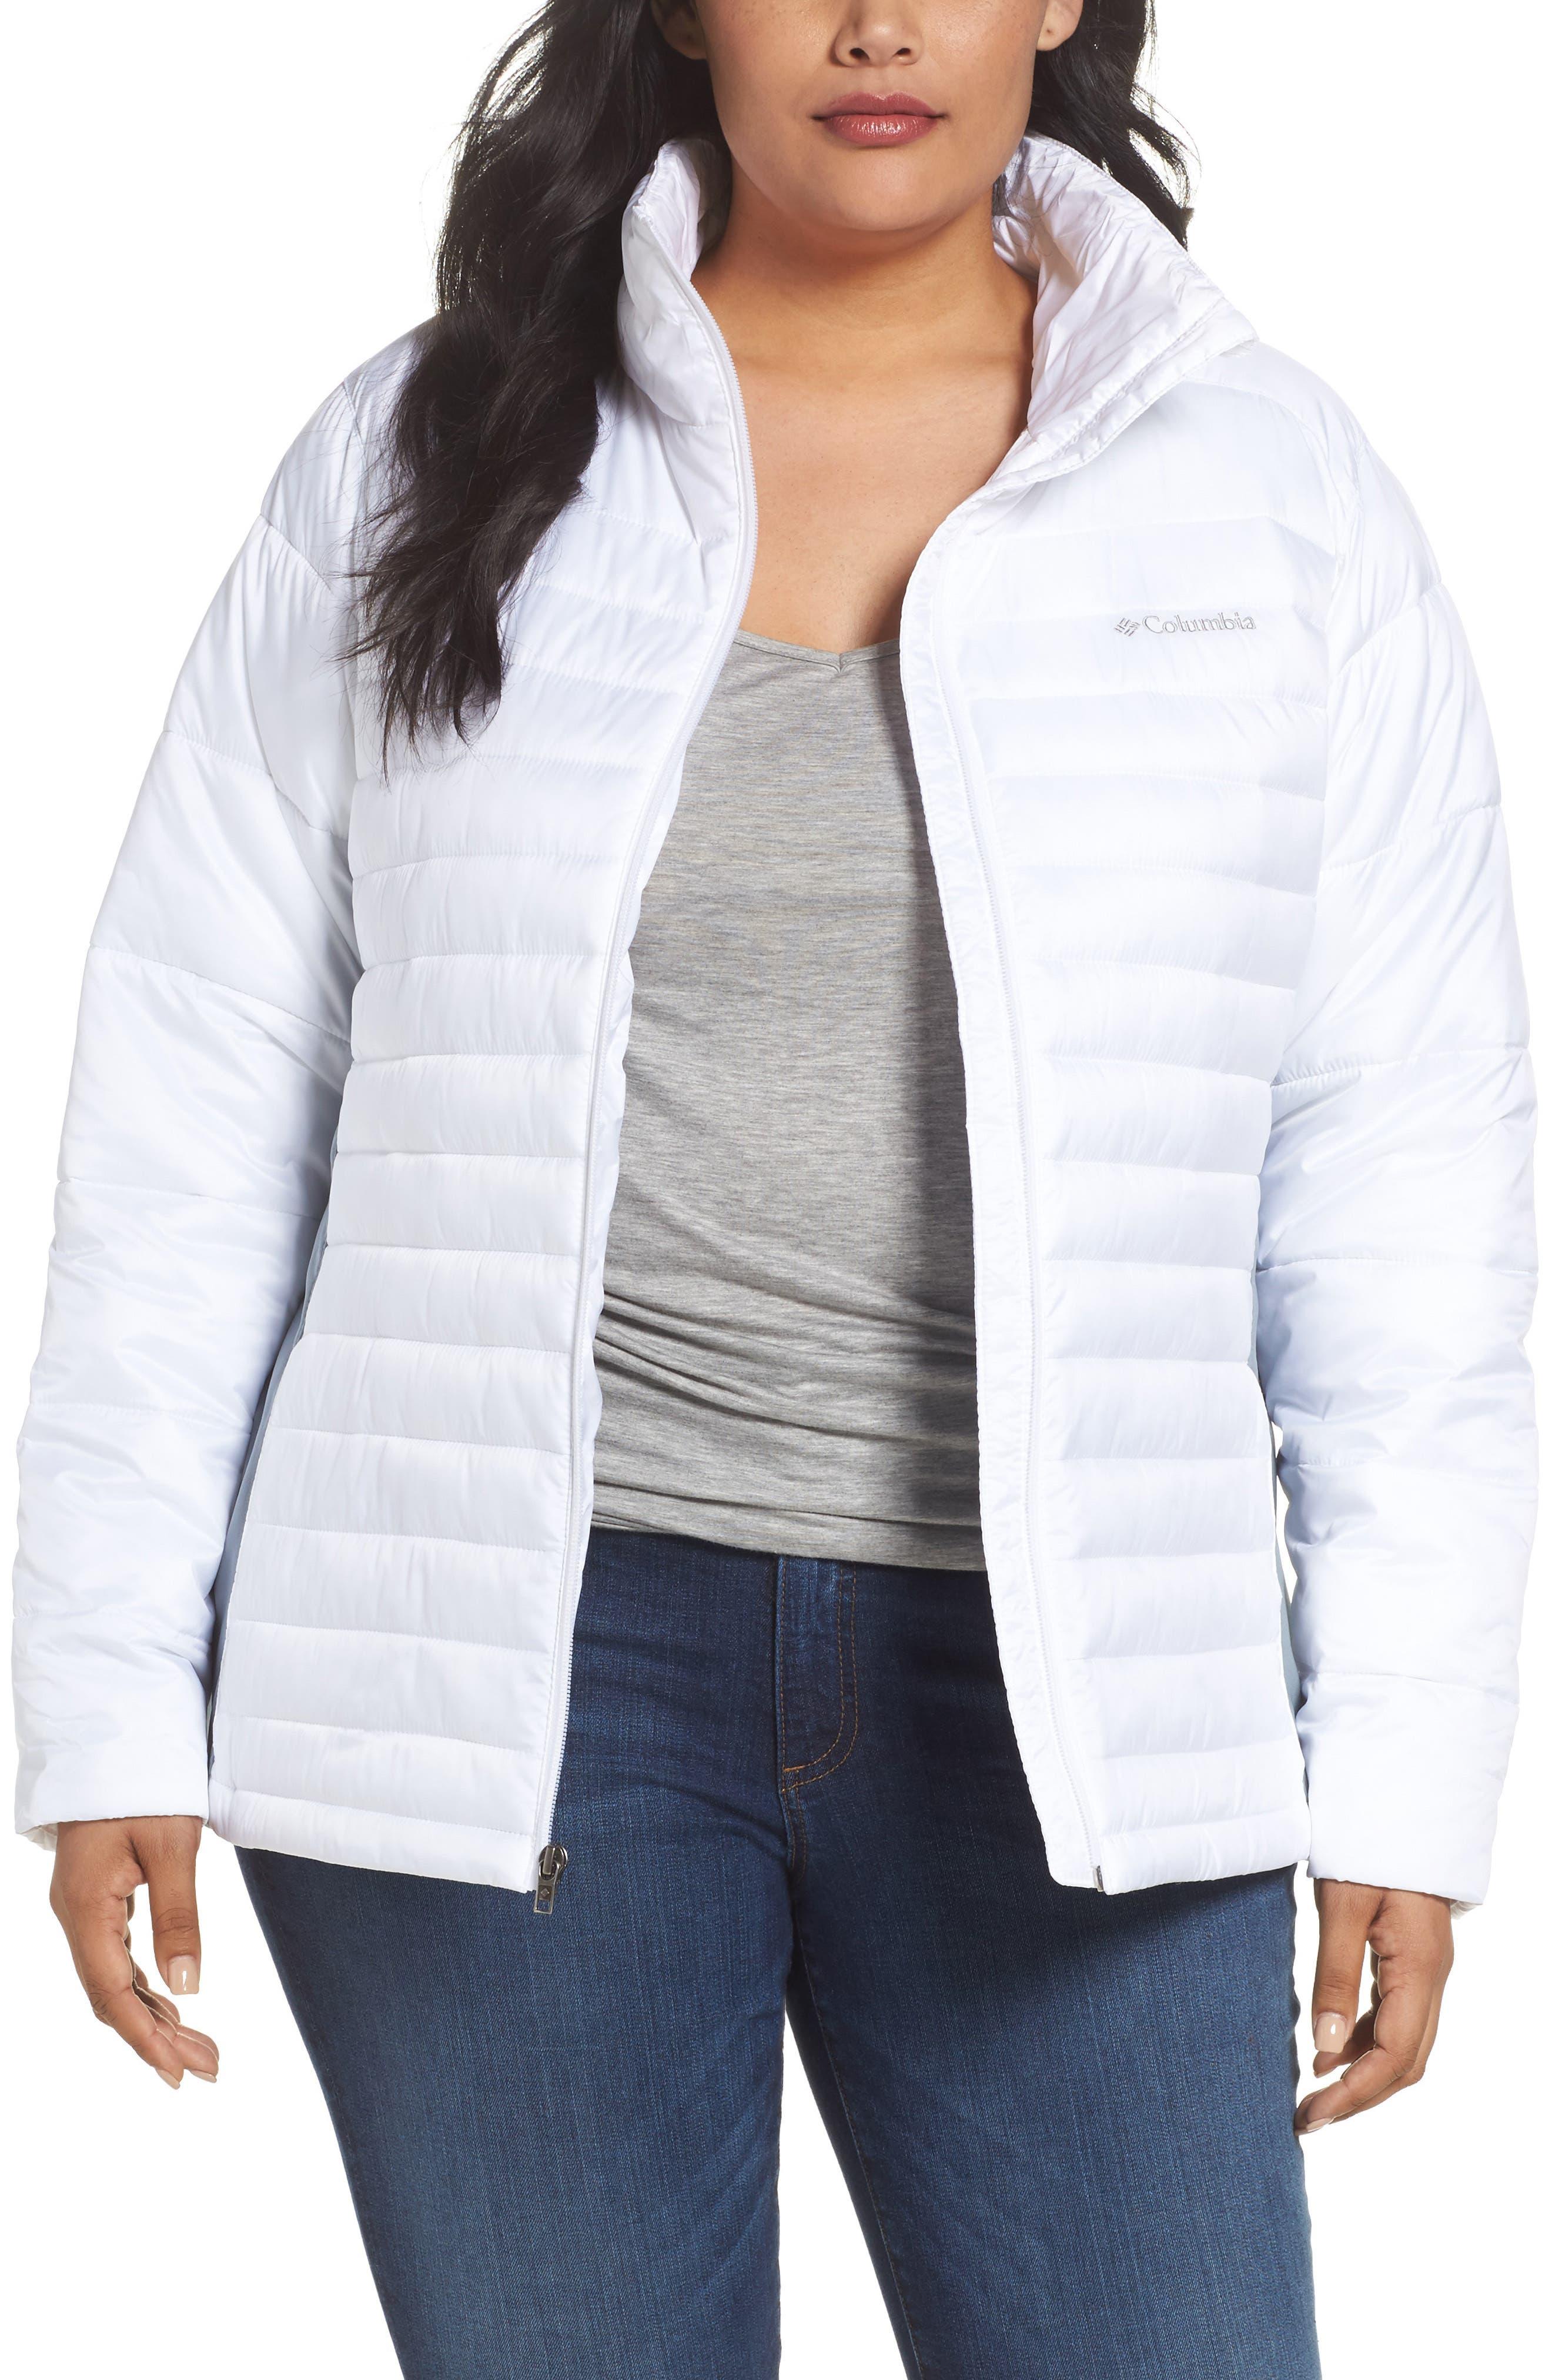 Powder Pillow Hybrid Jacket,                         Main,                         color, White/ Tradewinds Grey